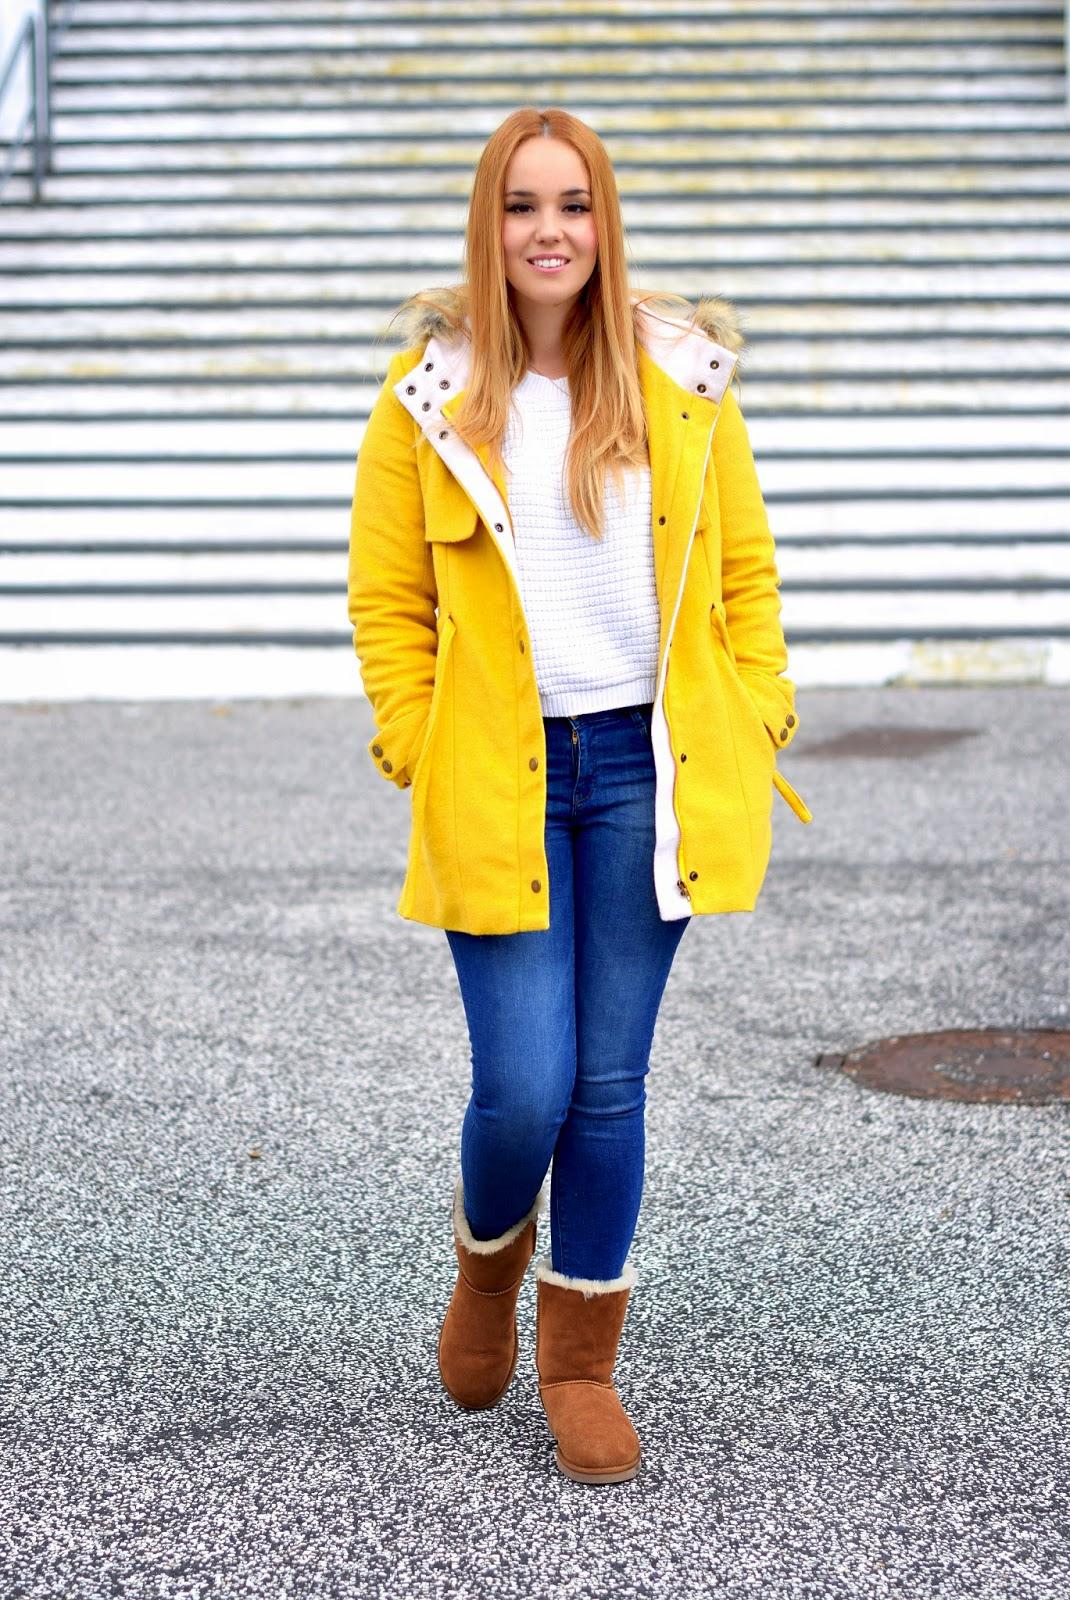 nery hdez, blackfive, ugg , look de dia, blonde, zara curve jeans